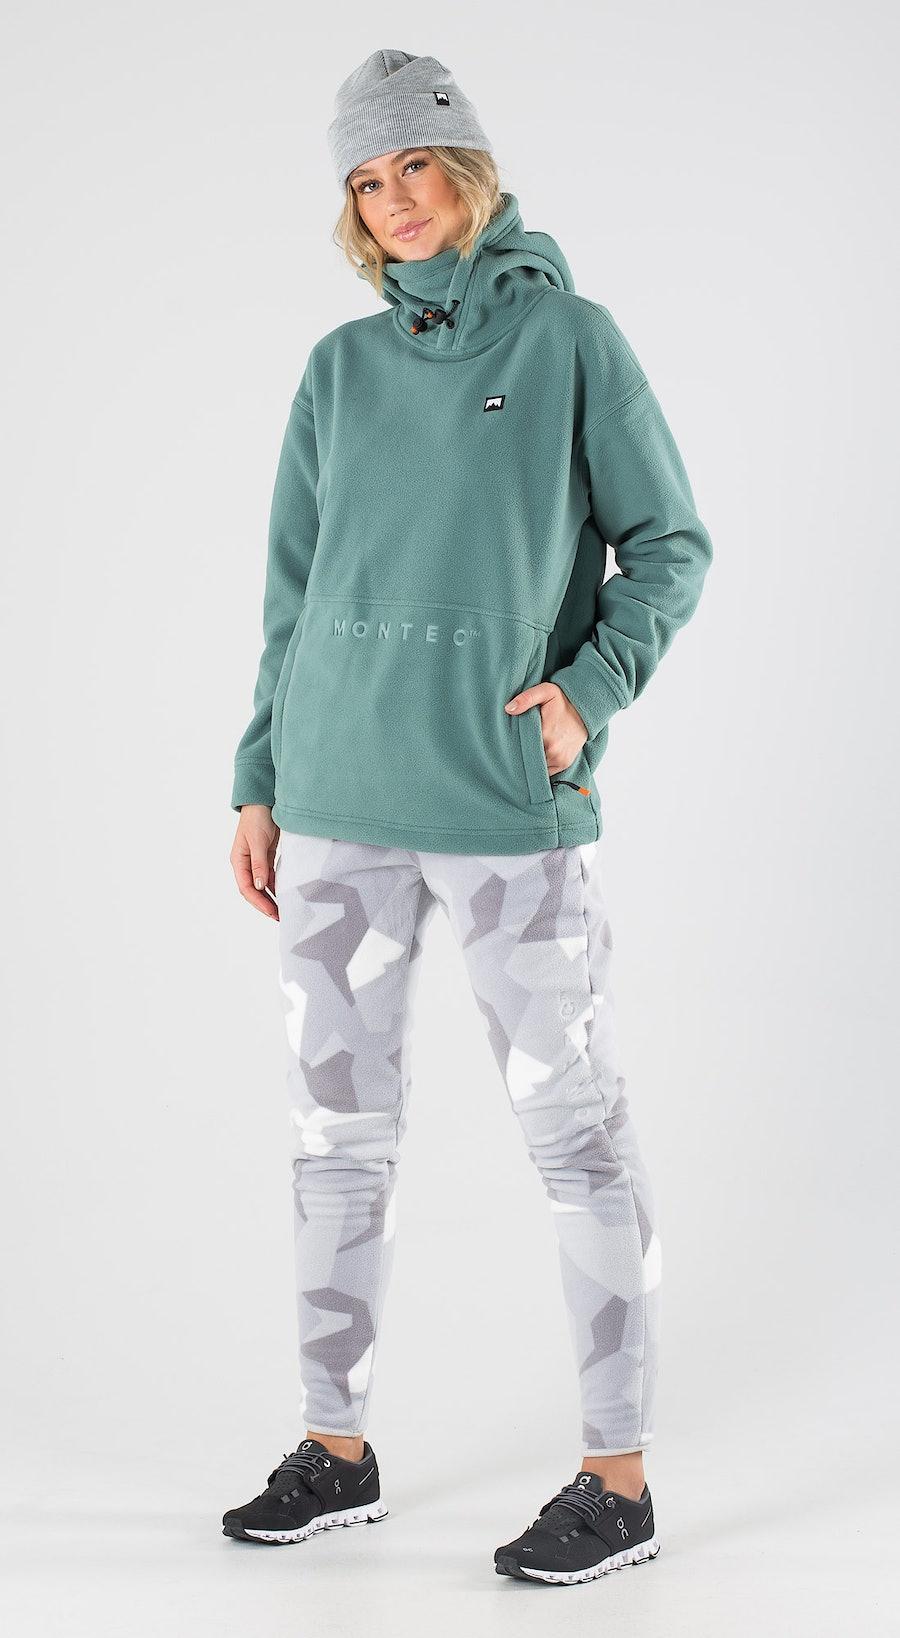 Montec Delta W Atlantic Outfit Multi